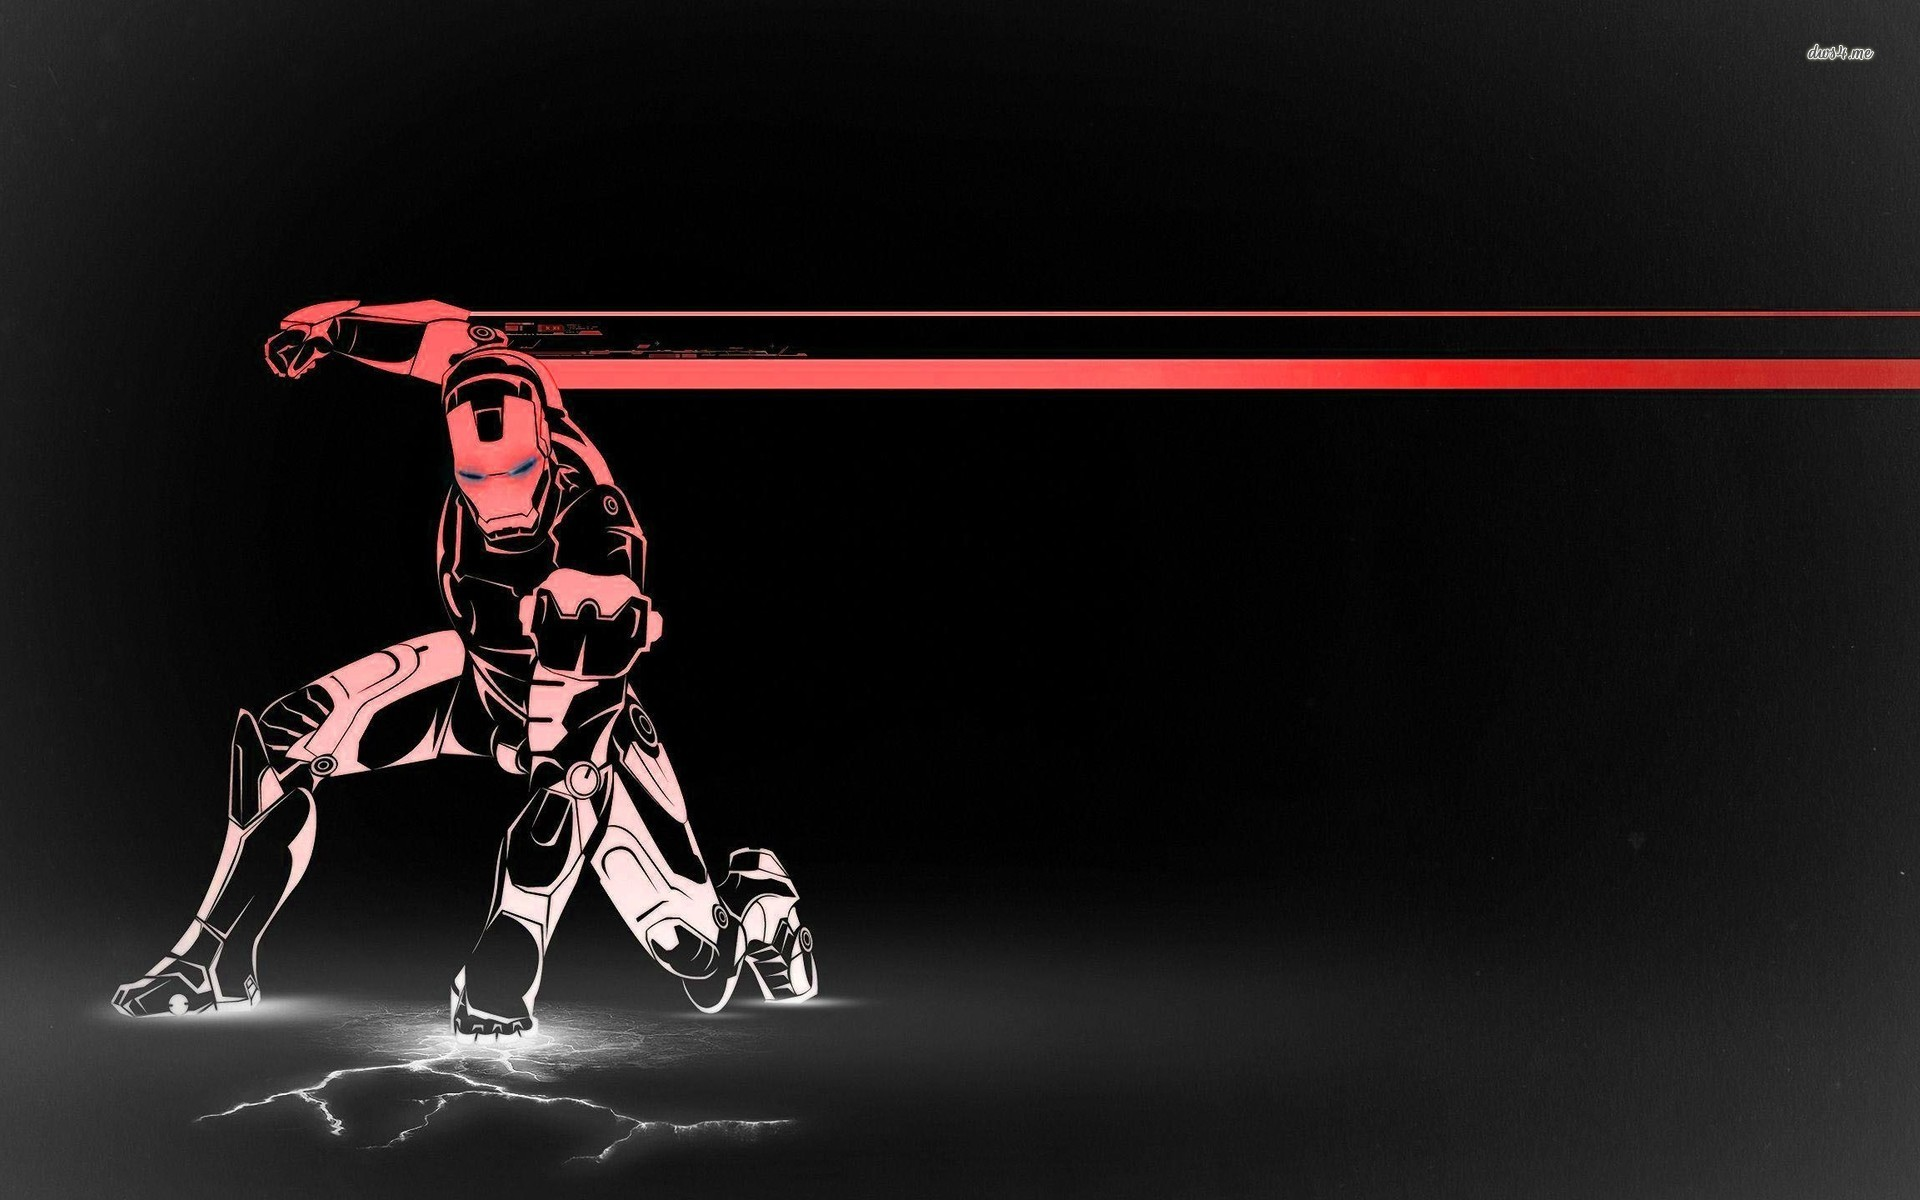 Iron Man Hd Free Wallpaper Download